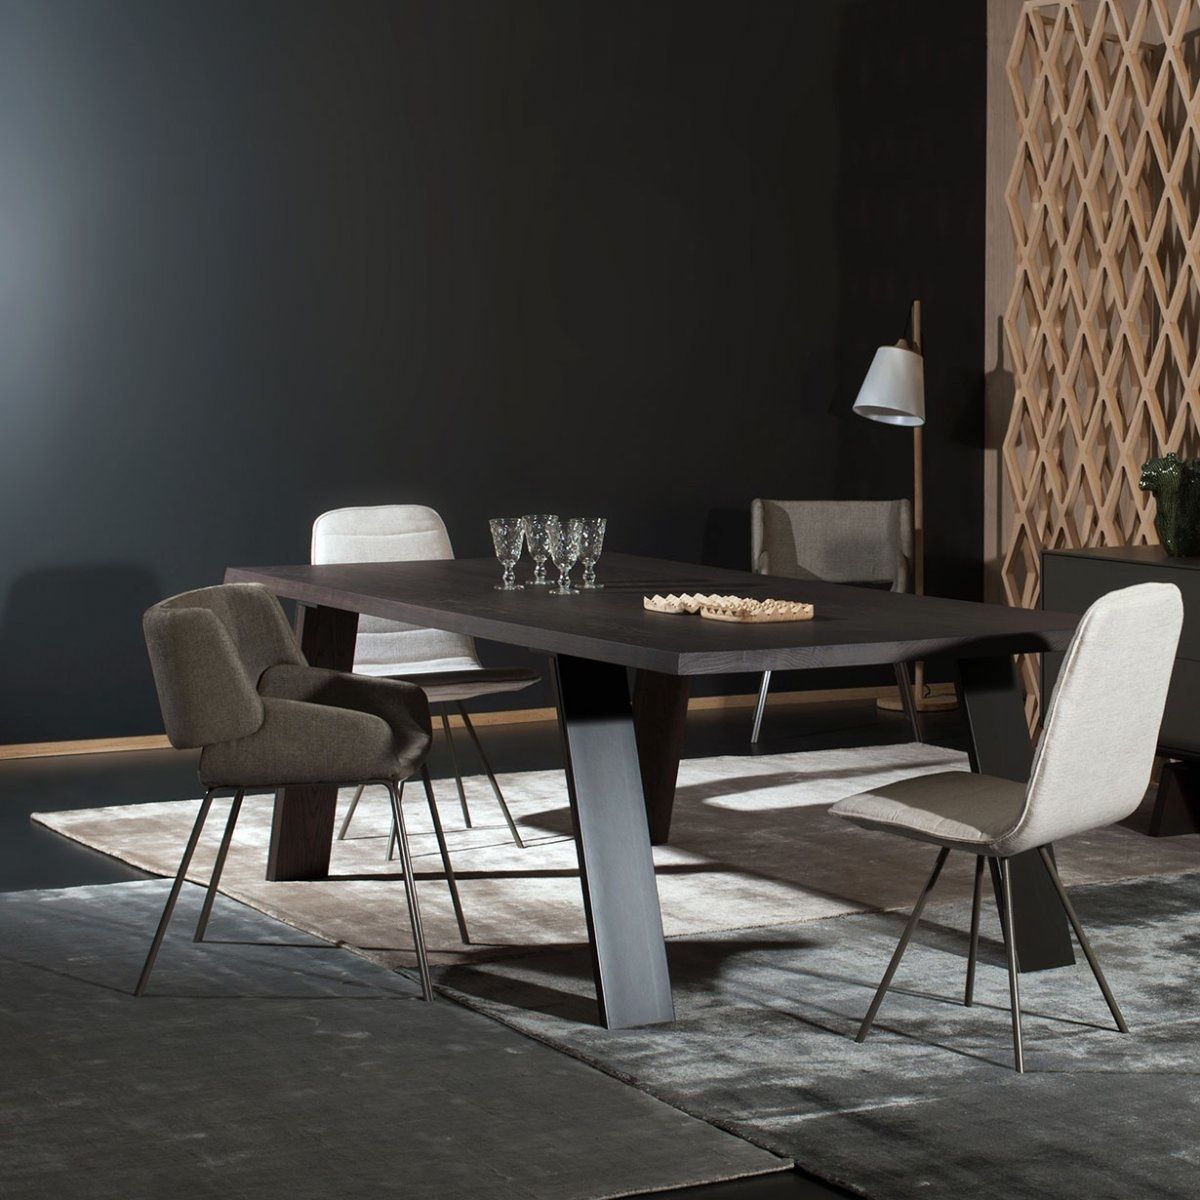 Koket at Salone del Mobile Milan 2017 | Hall, Max divani and Interiors